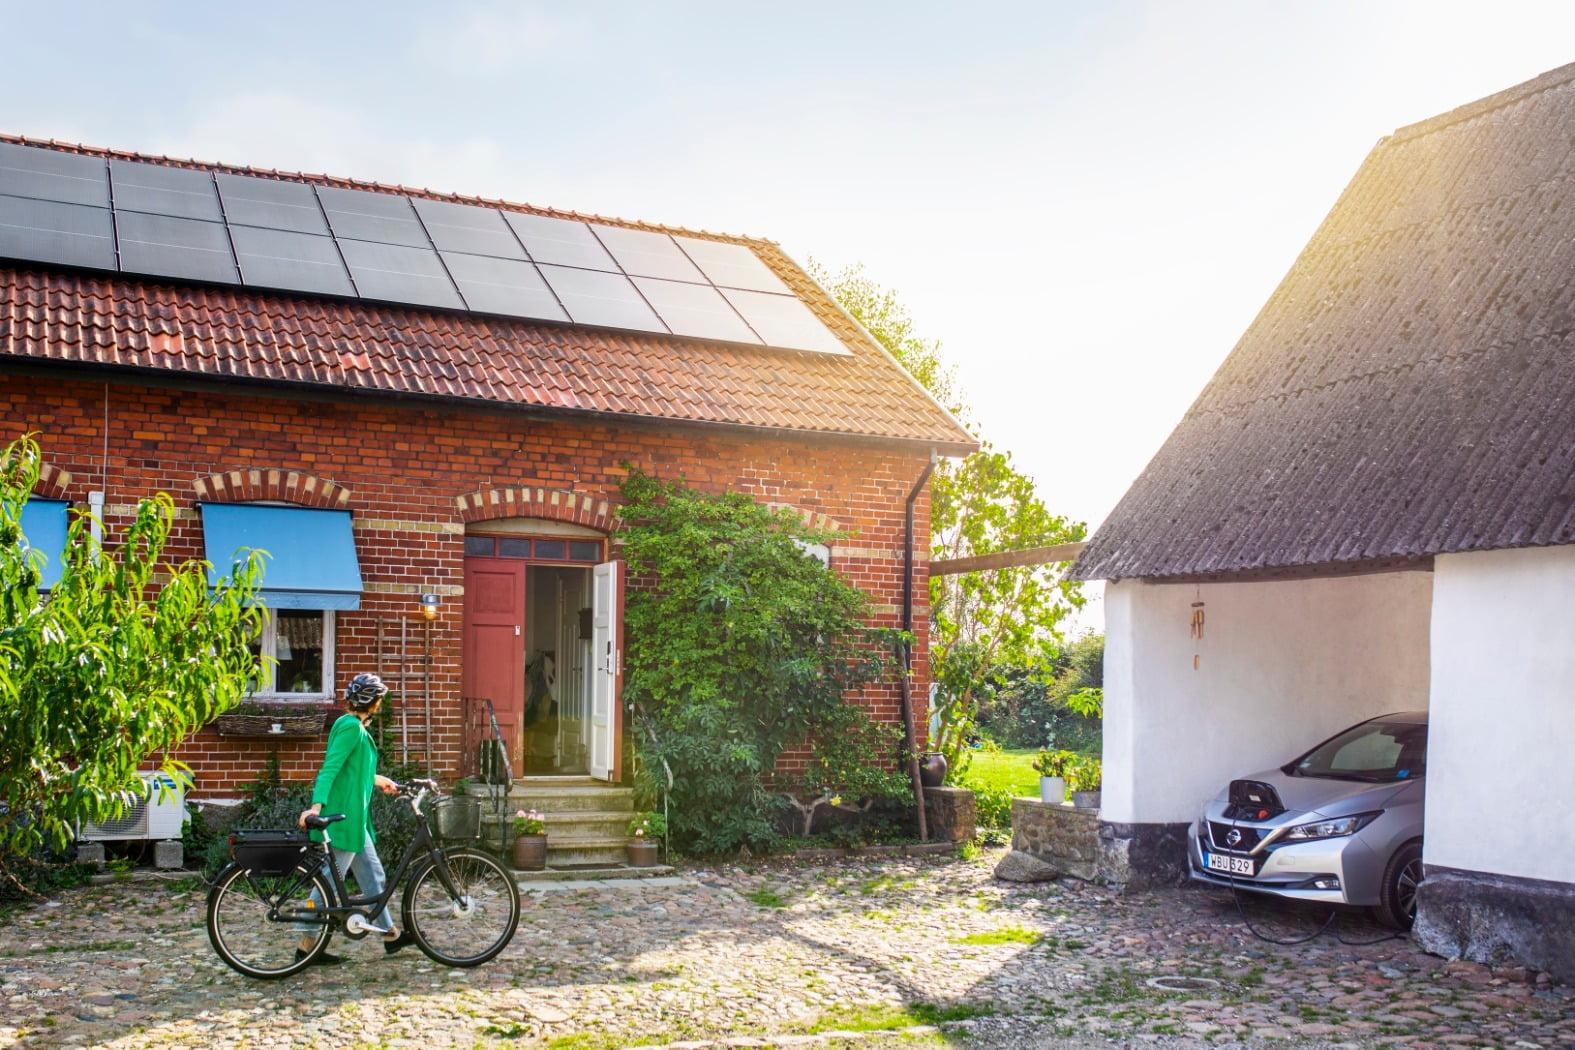 Tire, Sky, Wheel, Plant, Bicycle, Building, Car, Window, Vehicle, Green